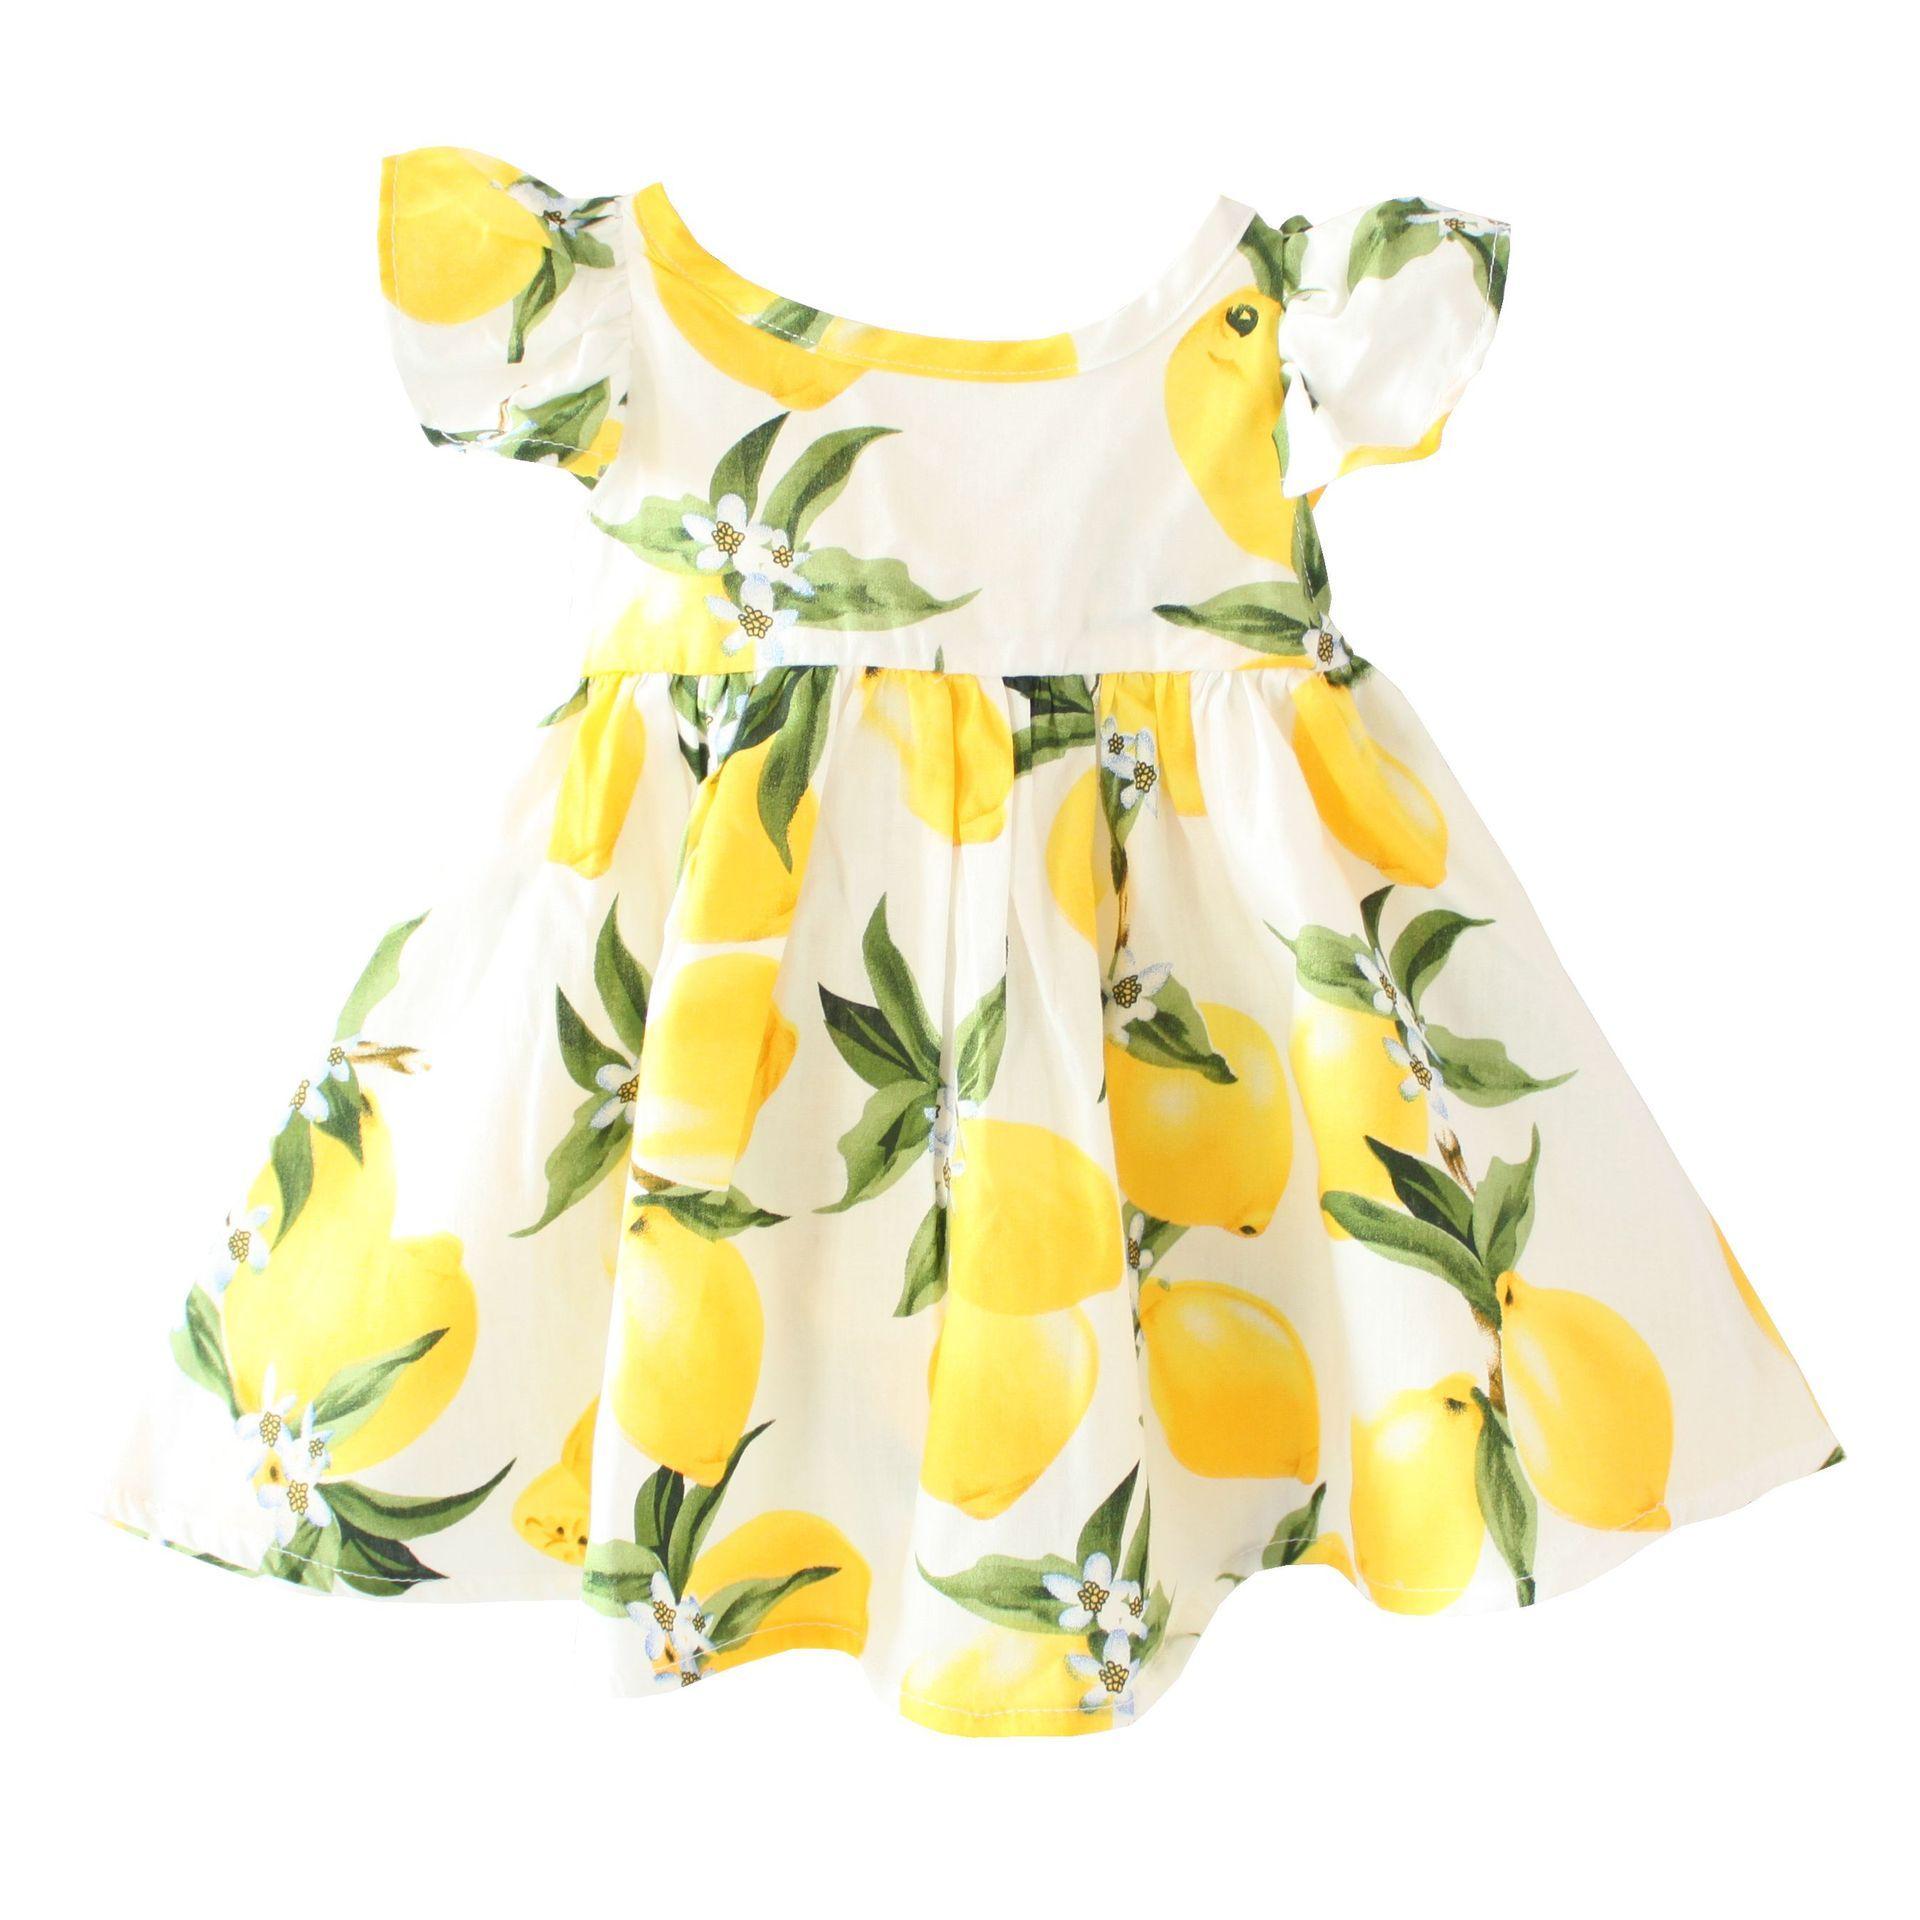 c5b093b4beac0 Fashion Lemon Girls Dress 2018 New Fruit Printed Fly Sleeve Children  Princess Dress Korean Ruffle Kids Party Dresses Baby Clothes C3418